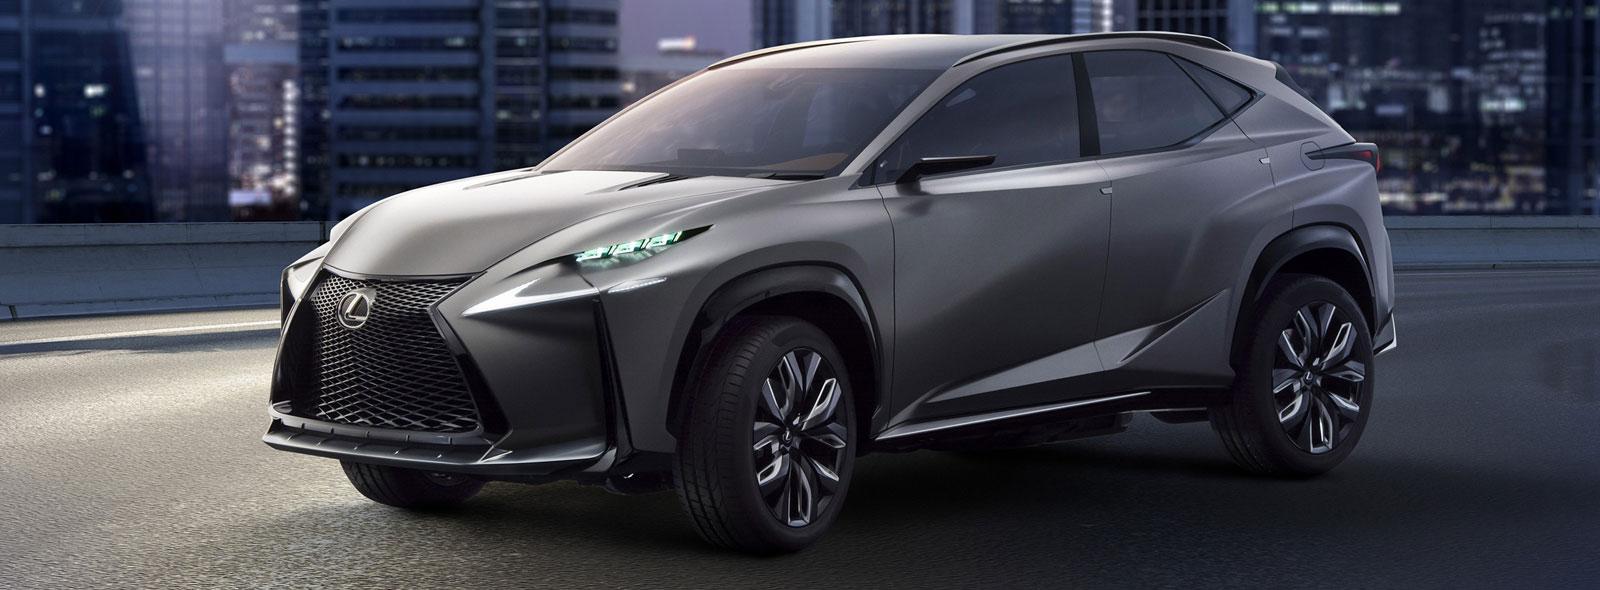 Lexus LF NX Concept avtomobili